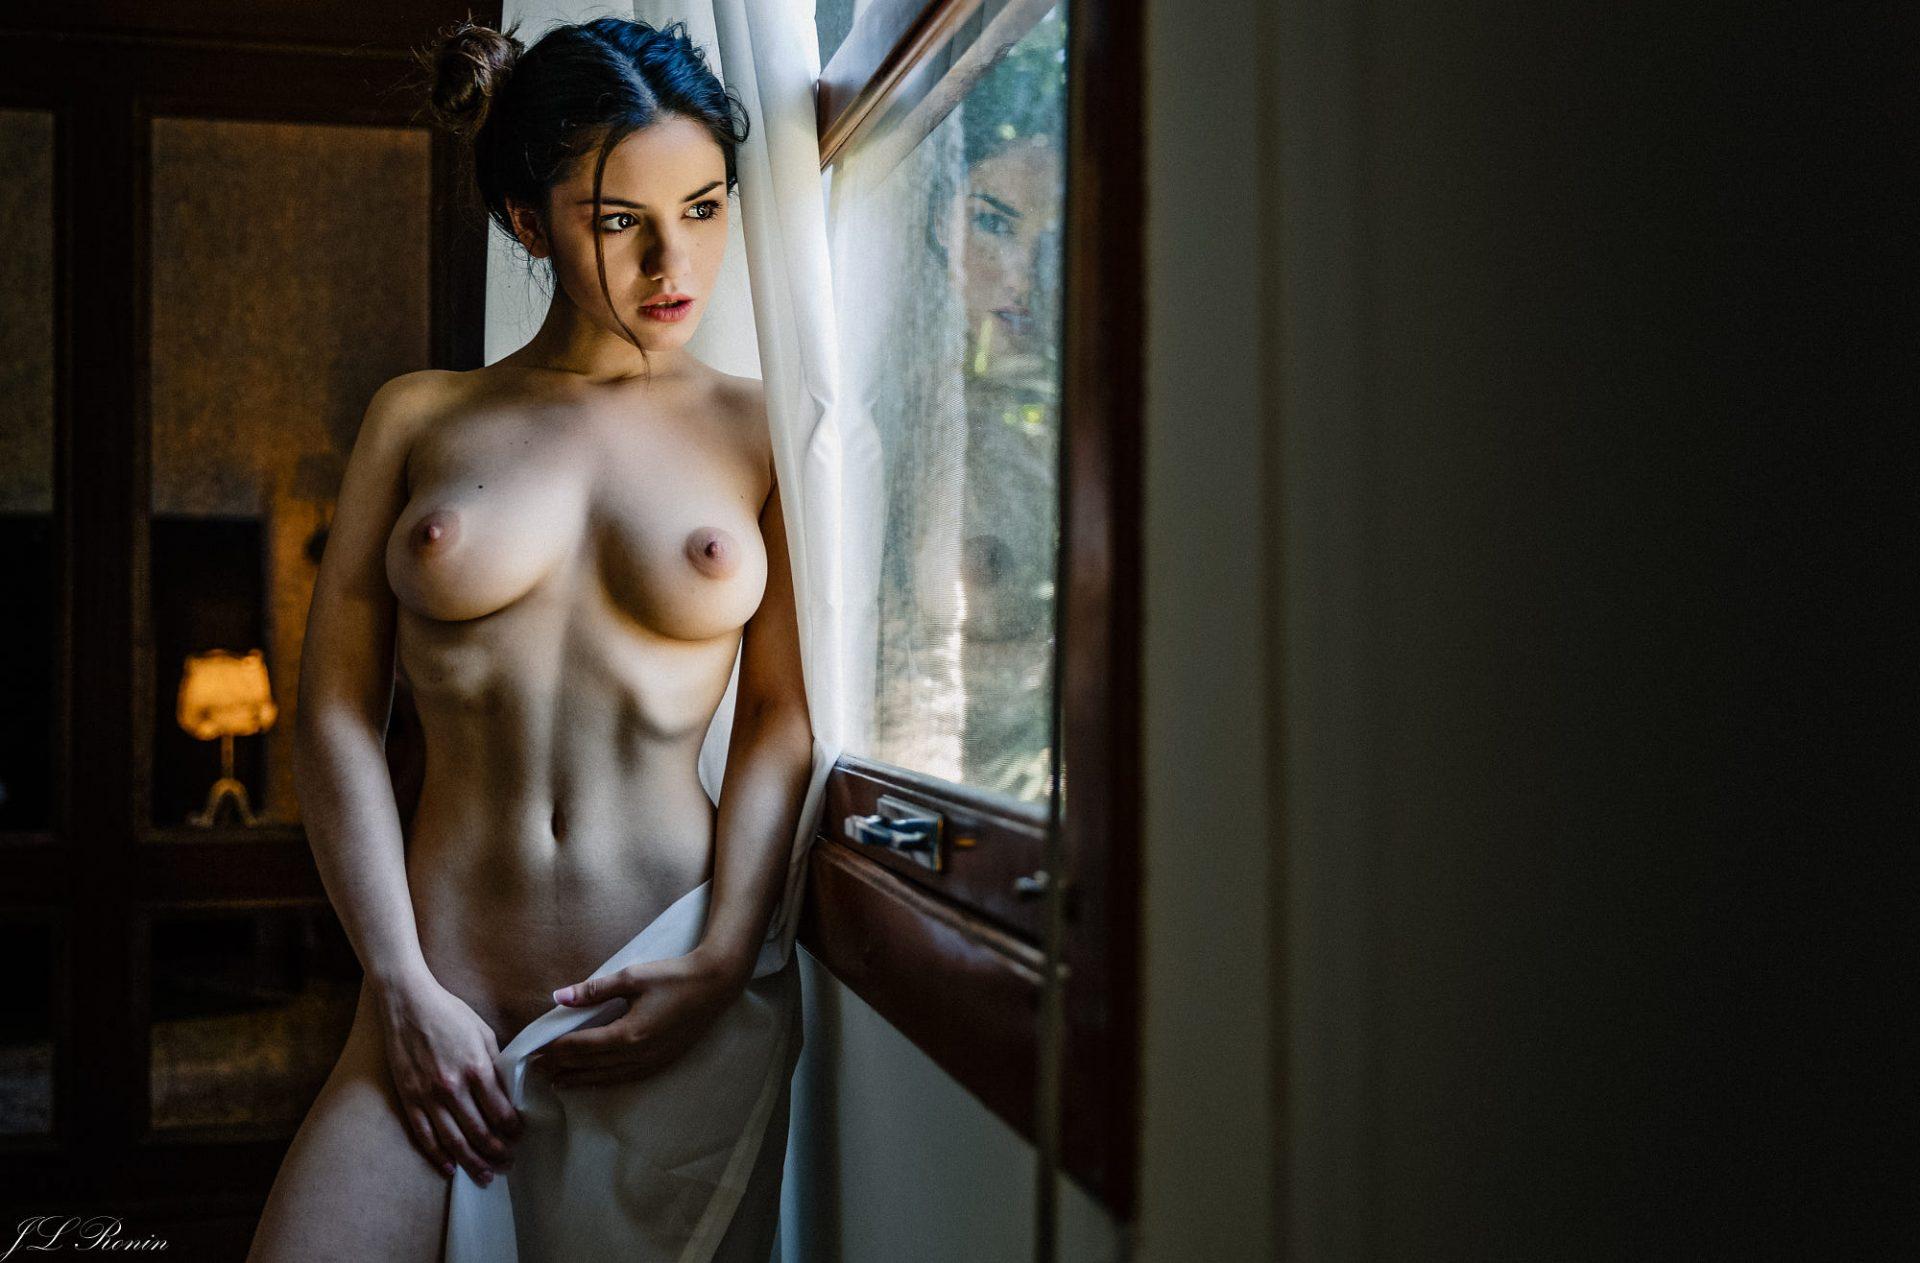 Delaia González by JL Ronin